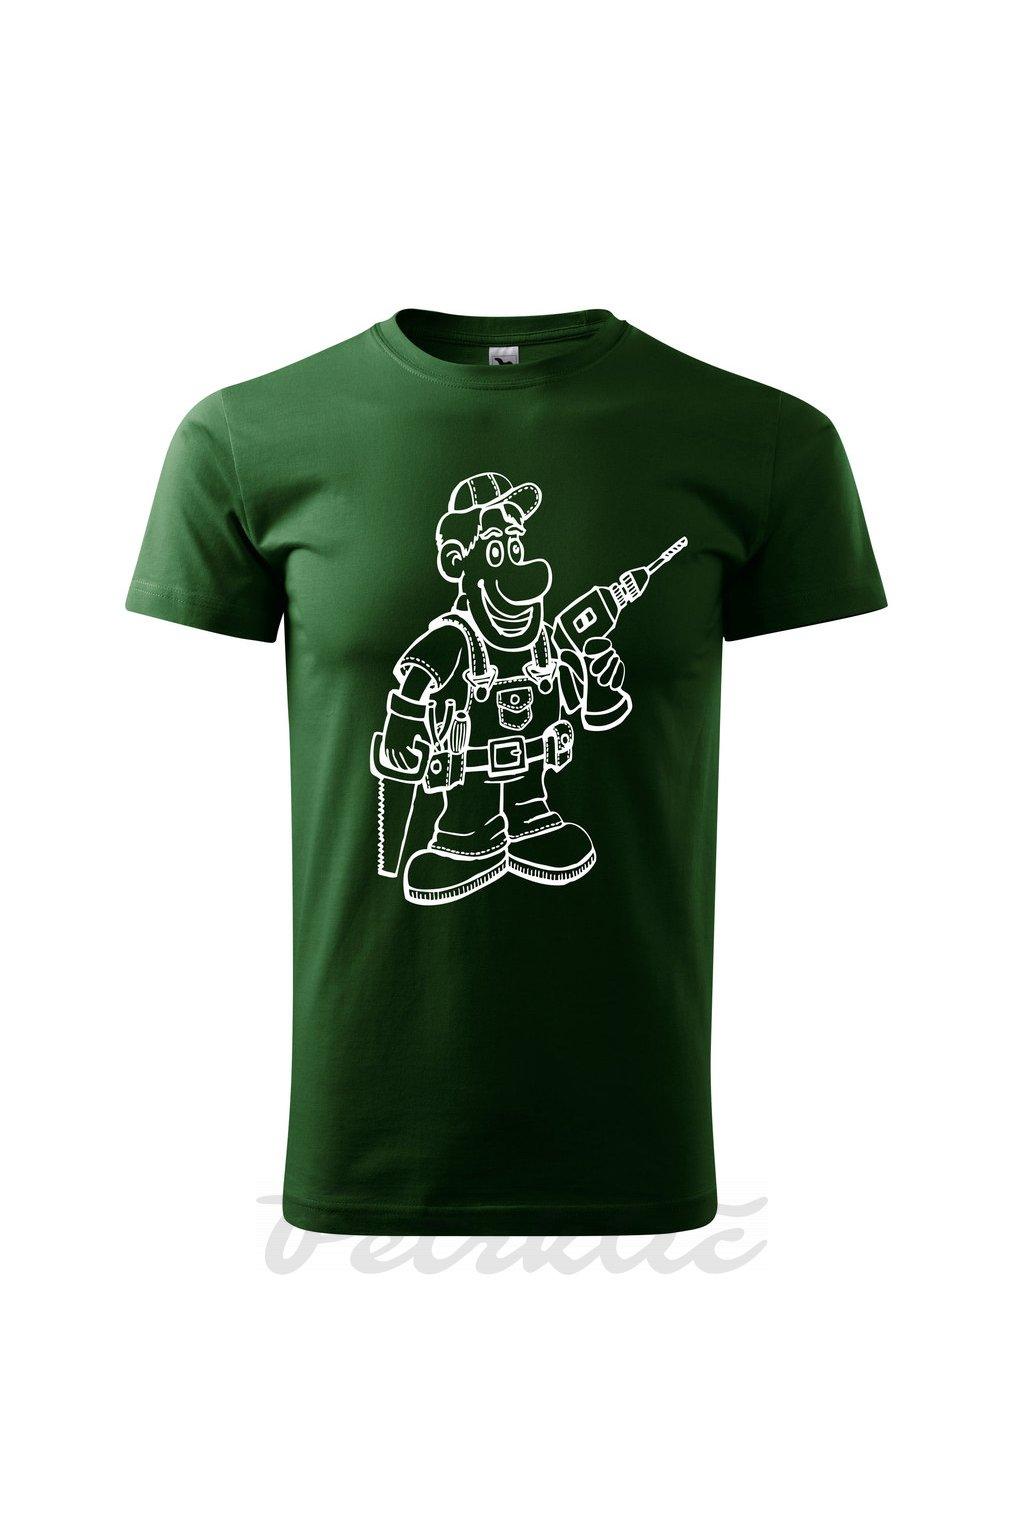 KUTIL - tričko